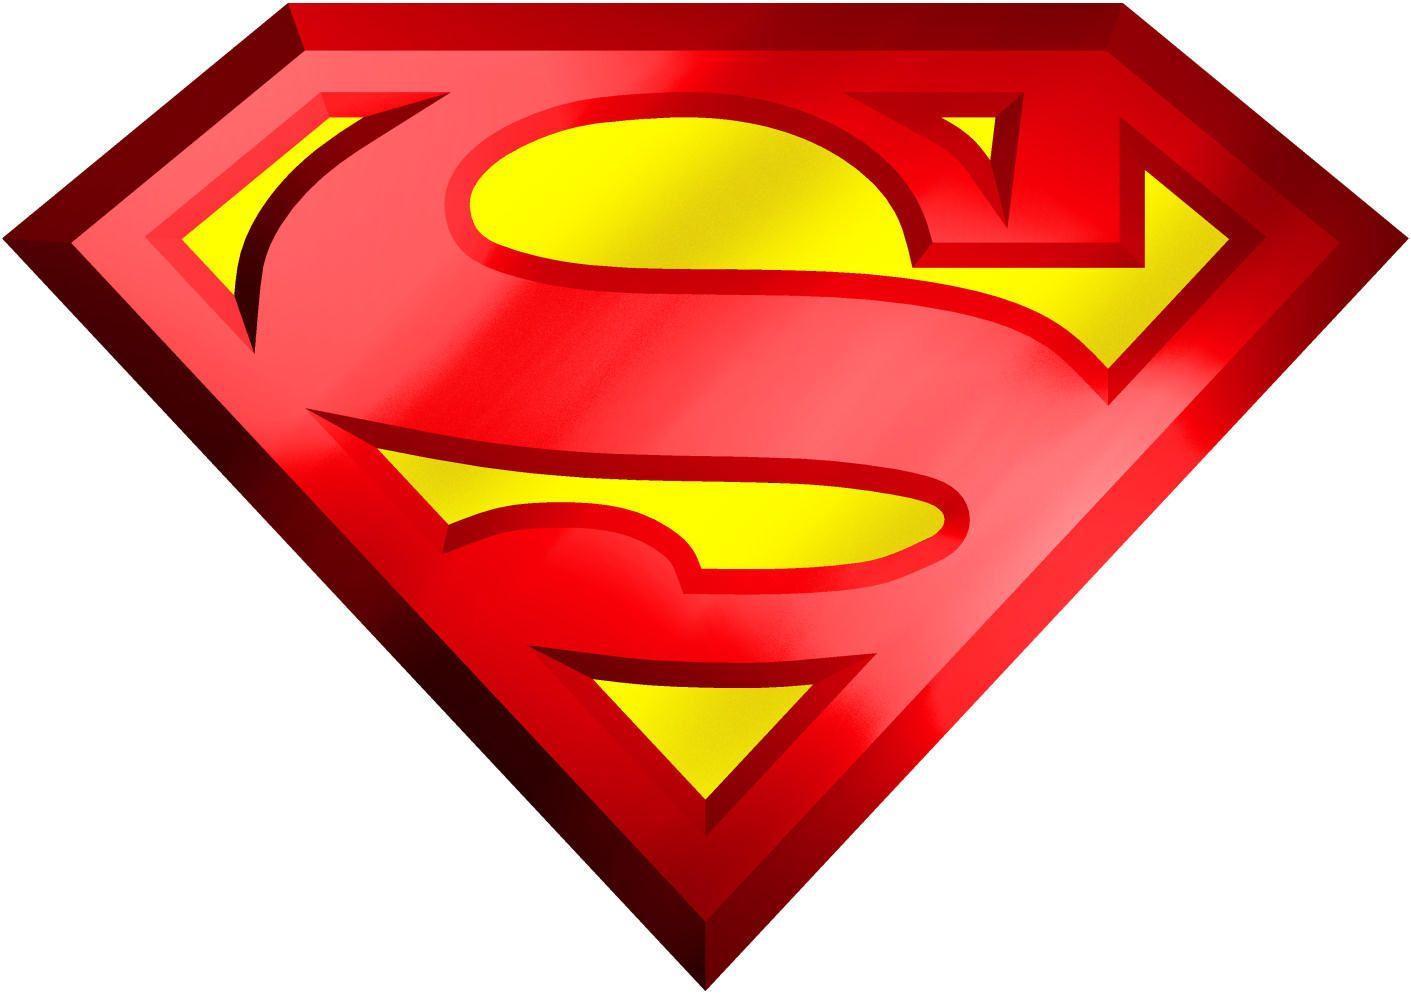 supergirl logo printable supergirl logo printable kids birthday rh br pinterest com superman logo printable images superman emblem printable